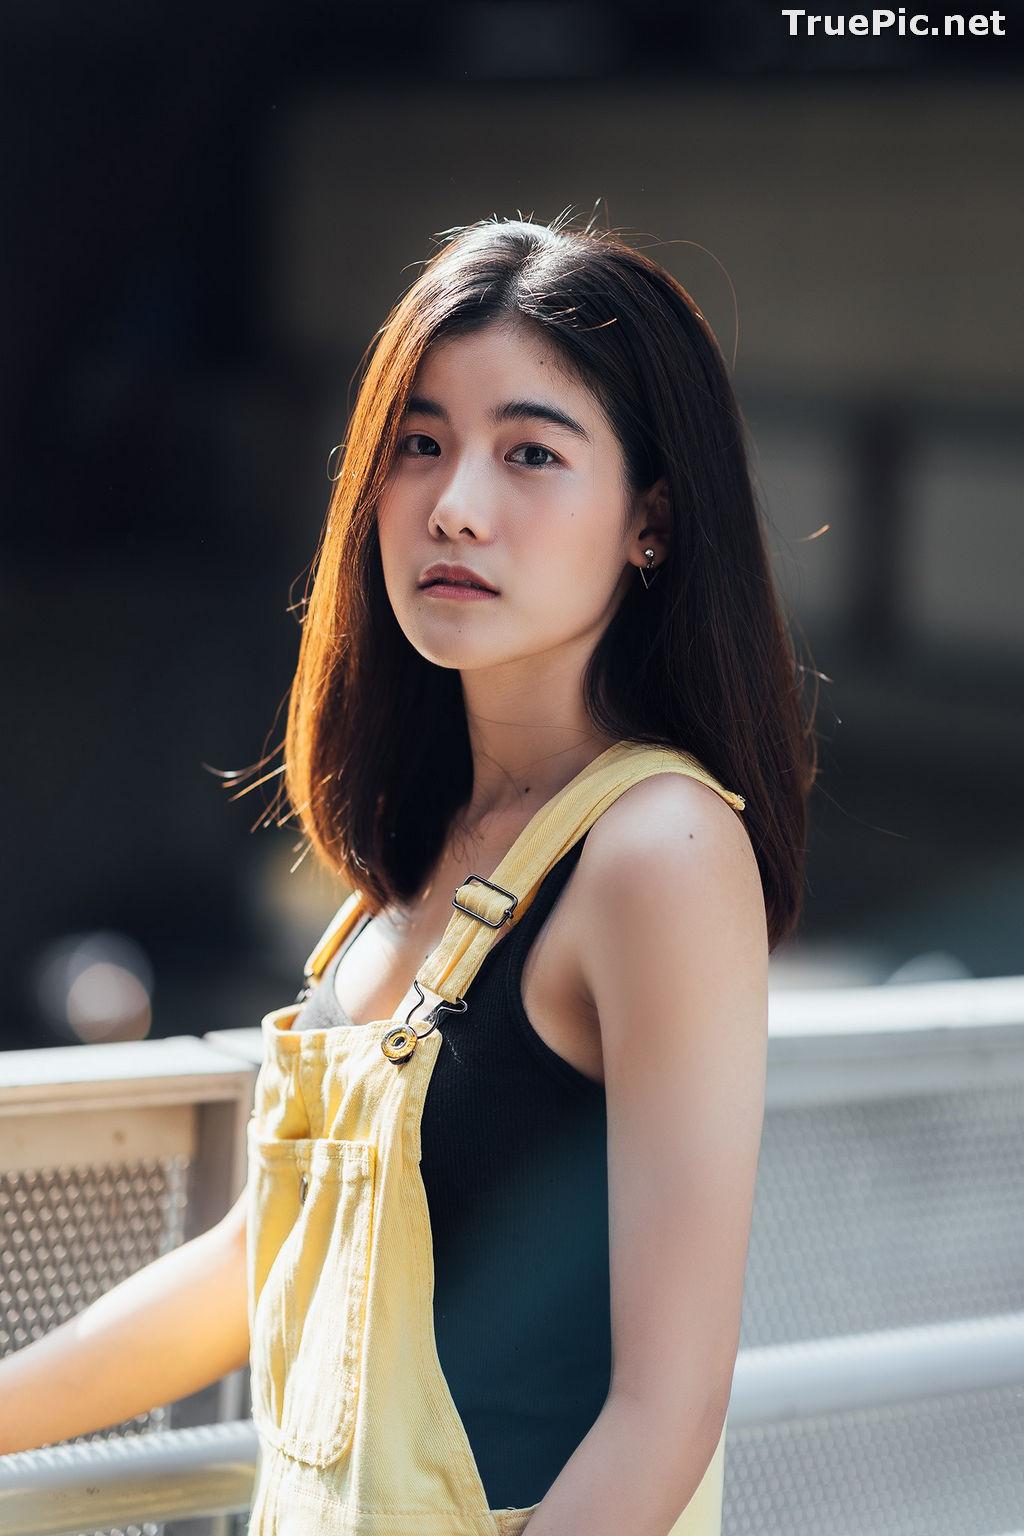 Image Thailand Model - Chanokneth Yospanya - Love Minions - TruePic.net - Picture-7